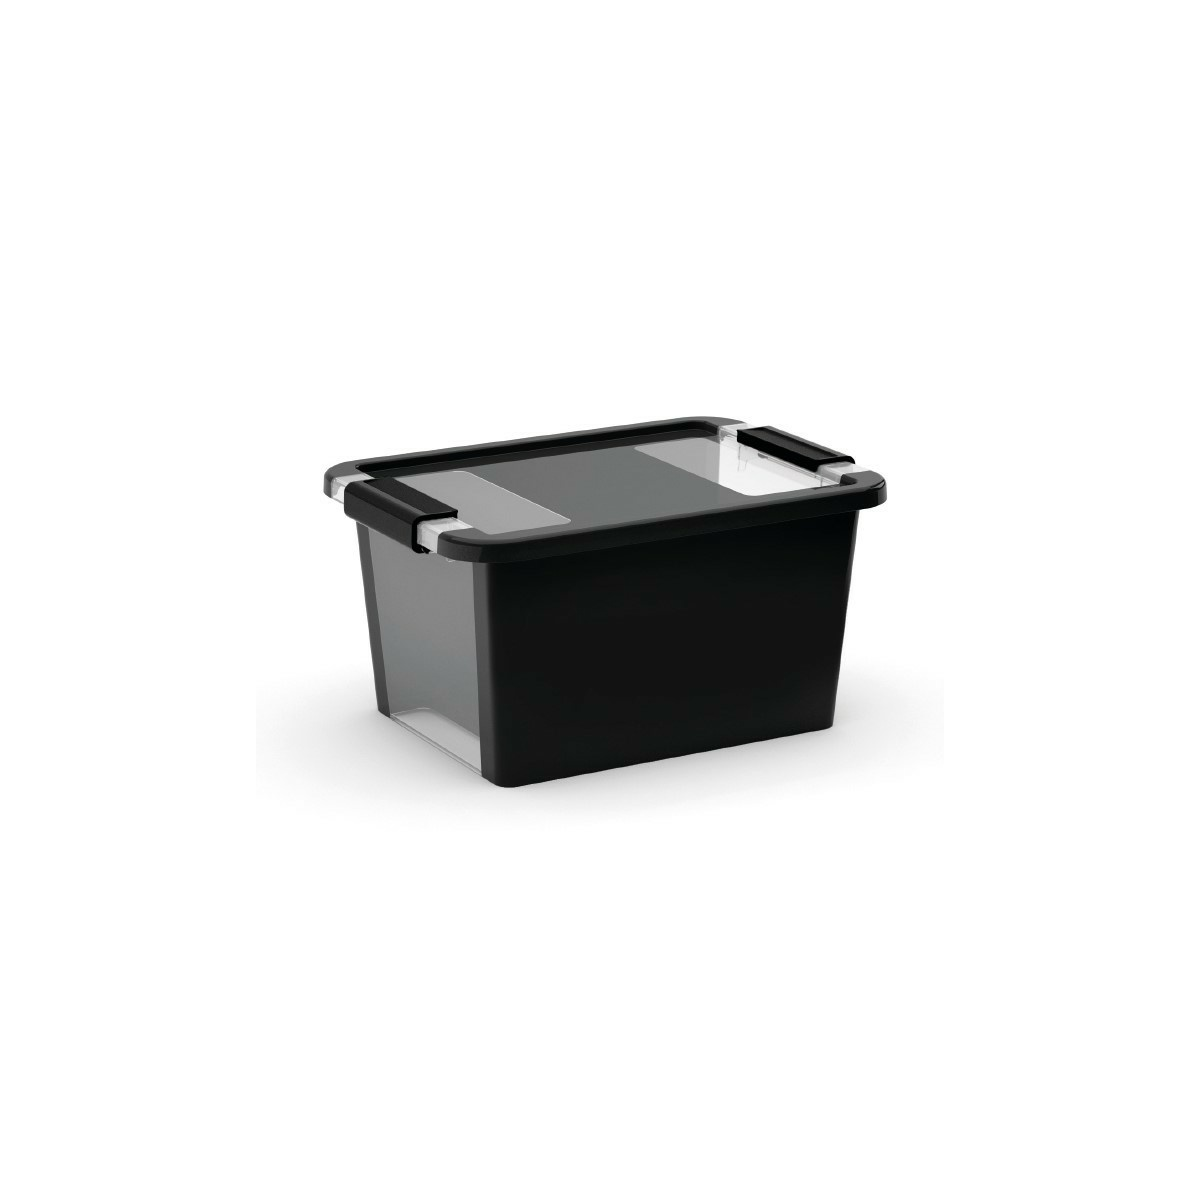 KIS Bi Box S - černý, 11l 84520000473